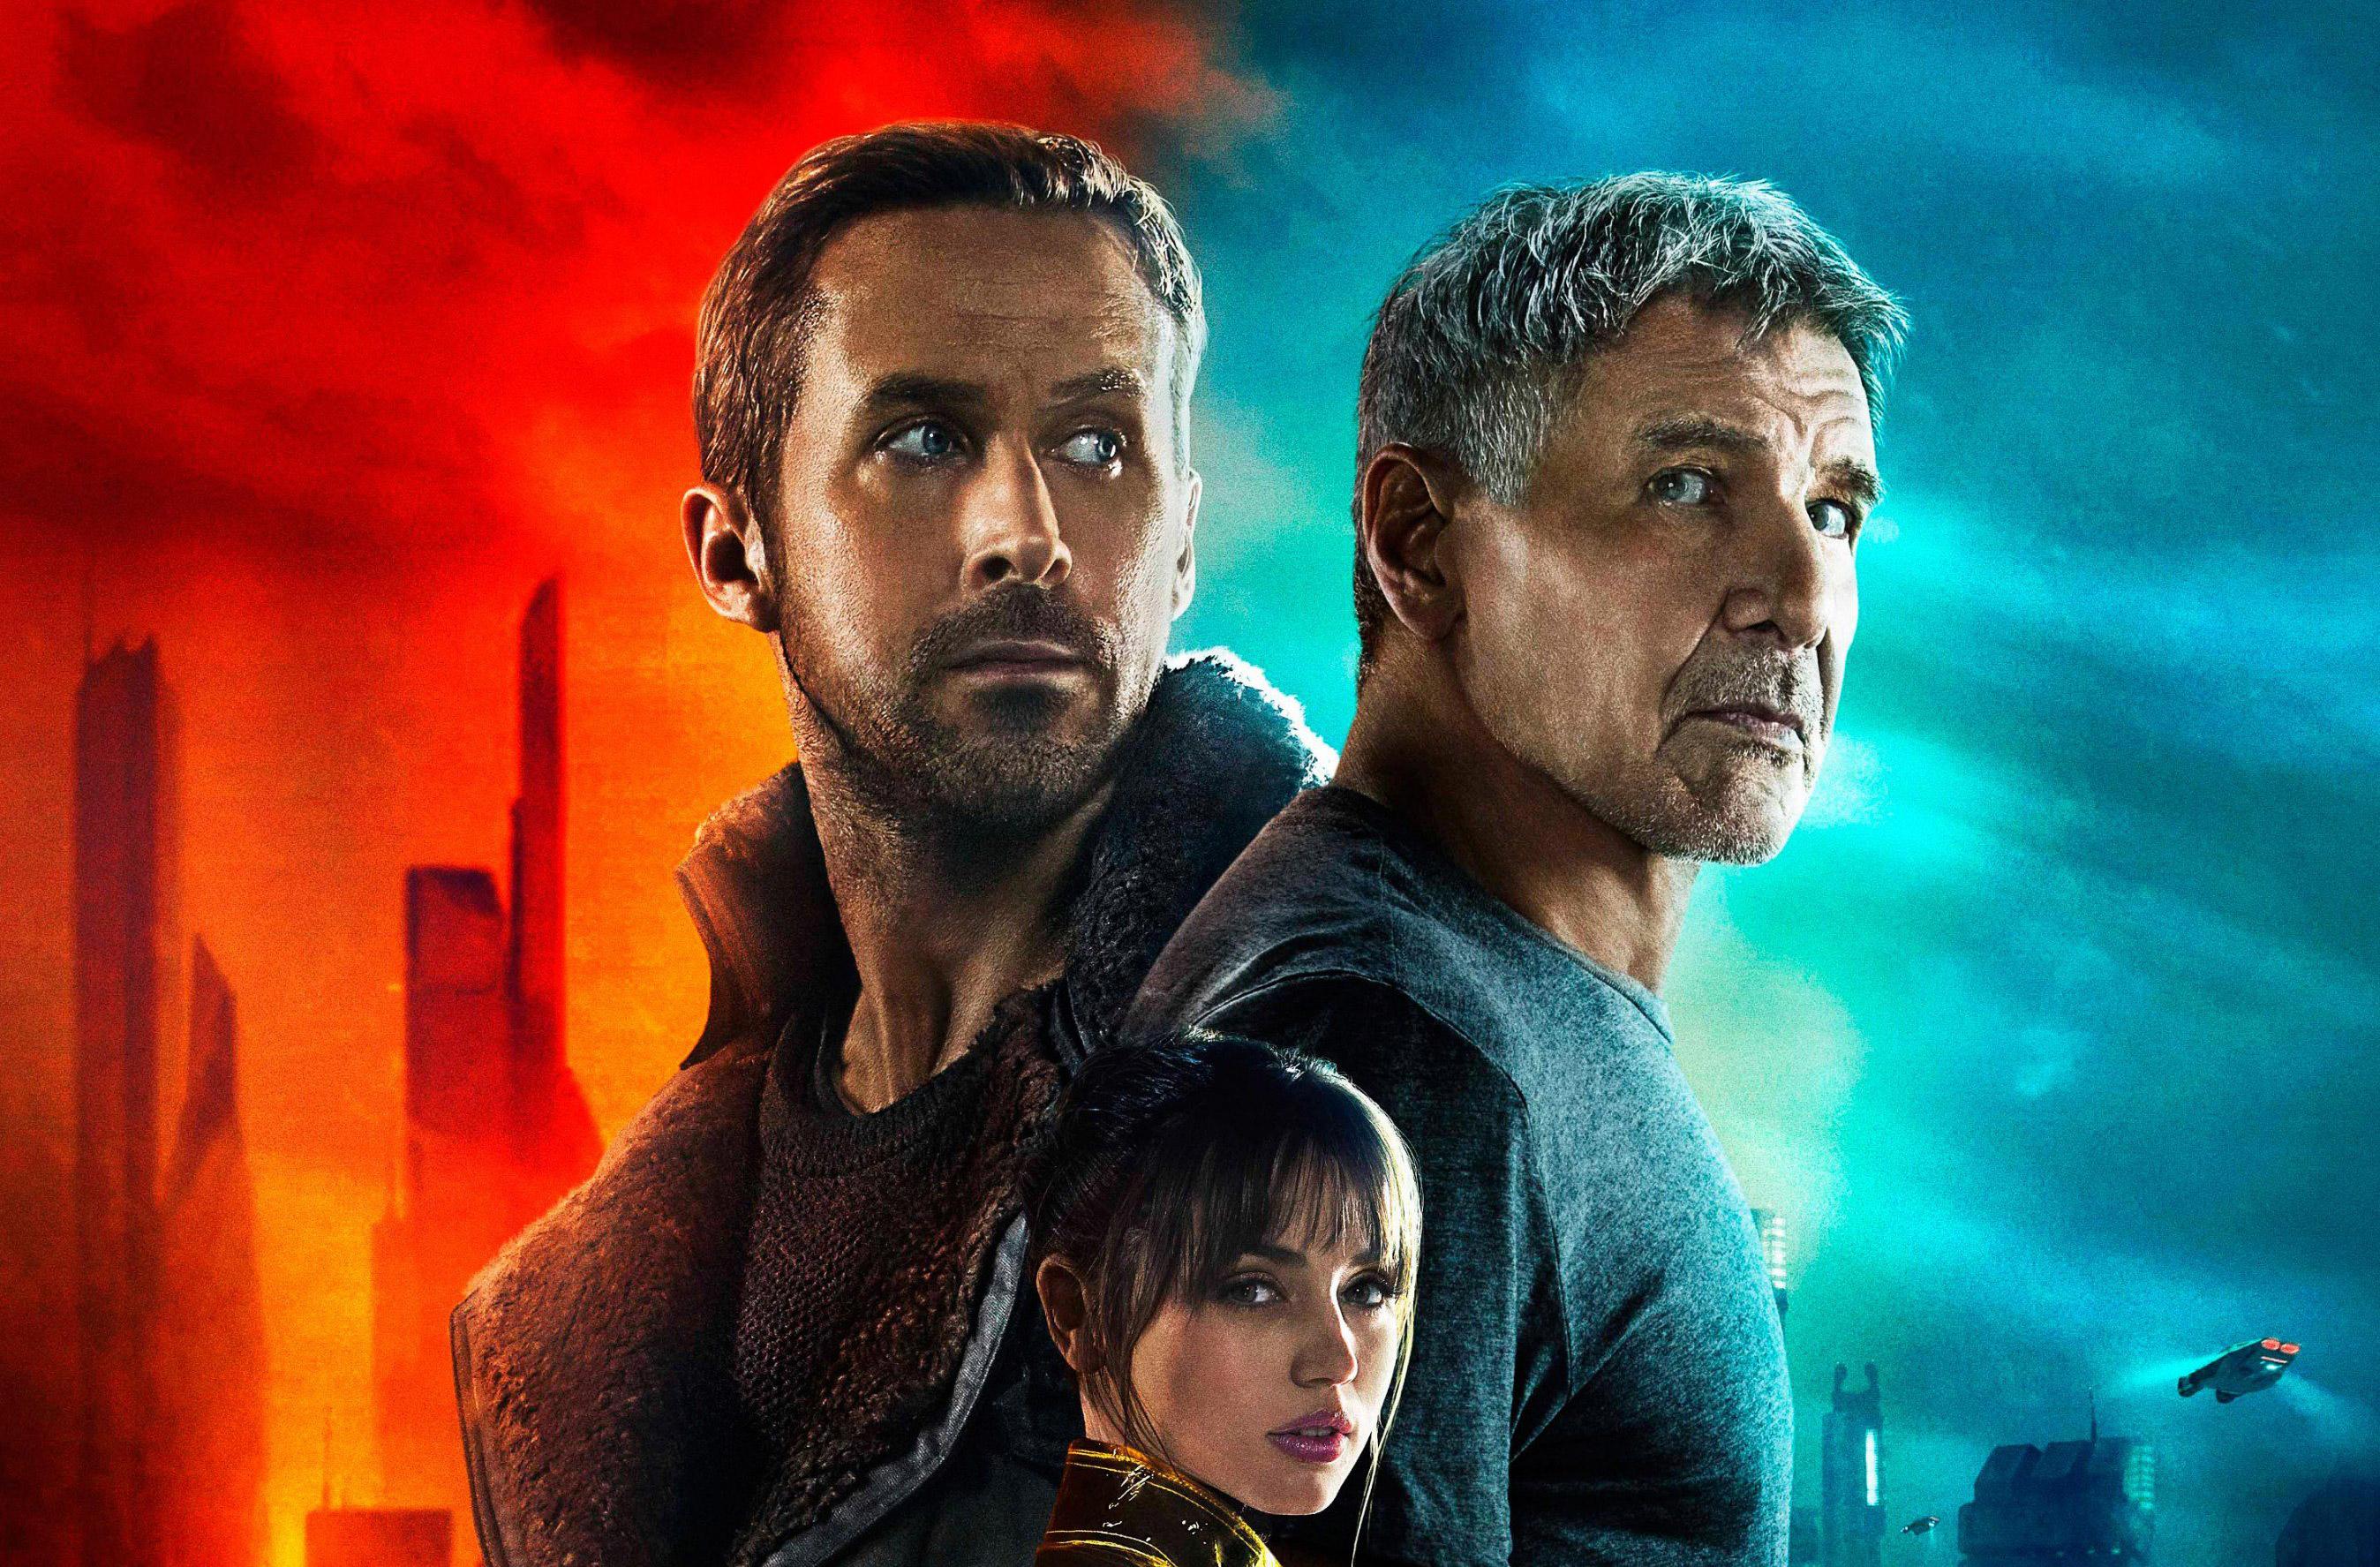 Blade Runner 2049 Poster Wallpaper, HD Movies 4K ...